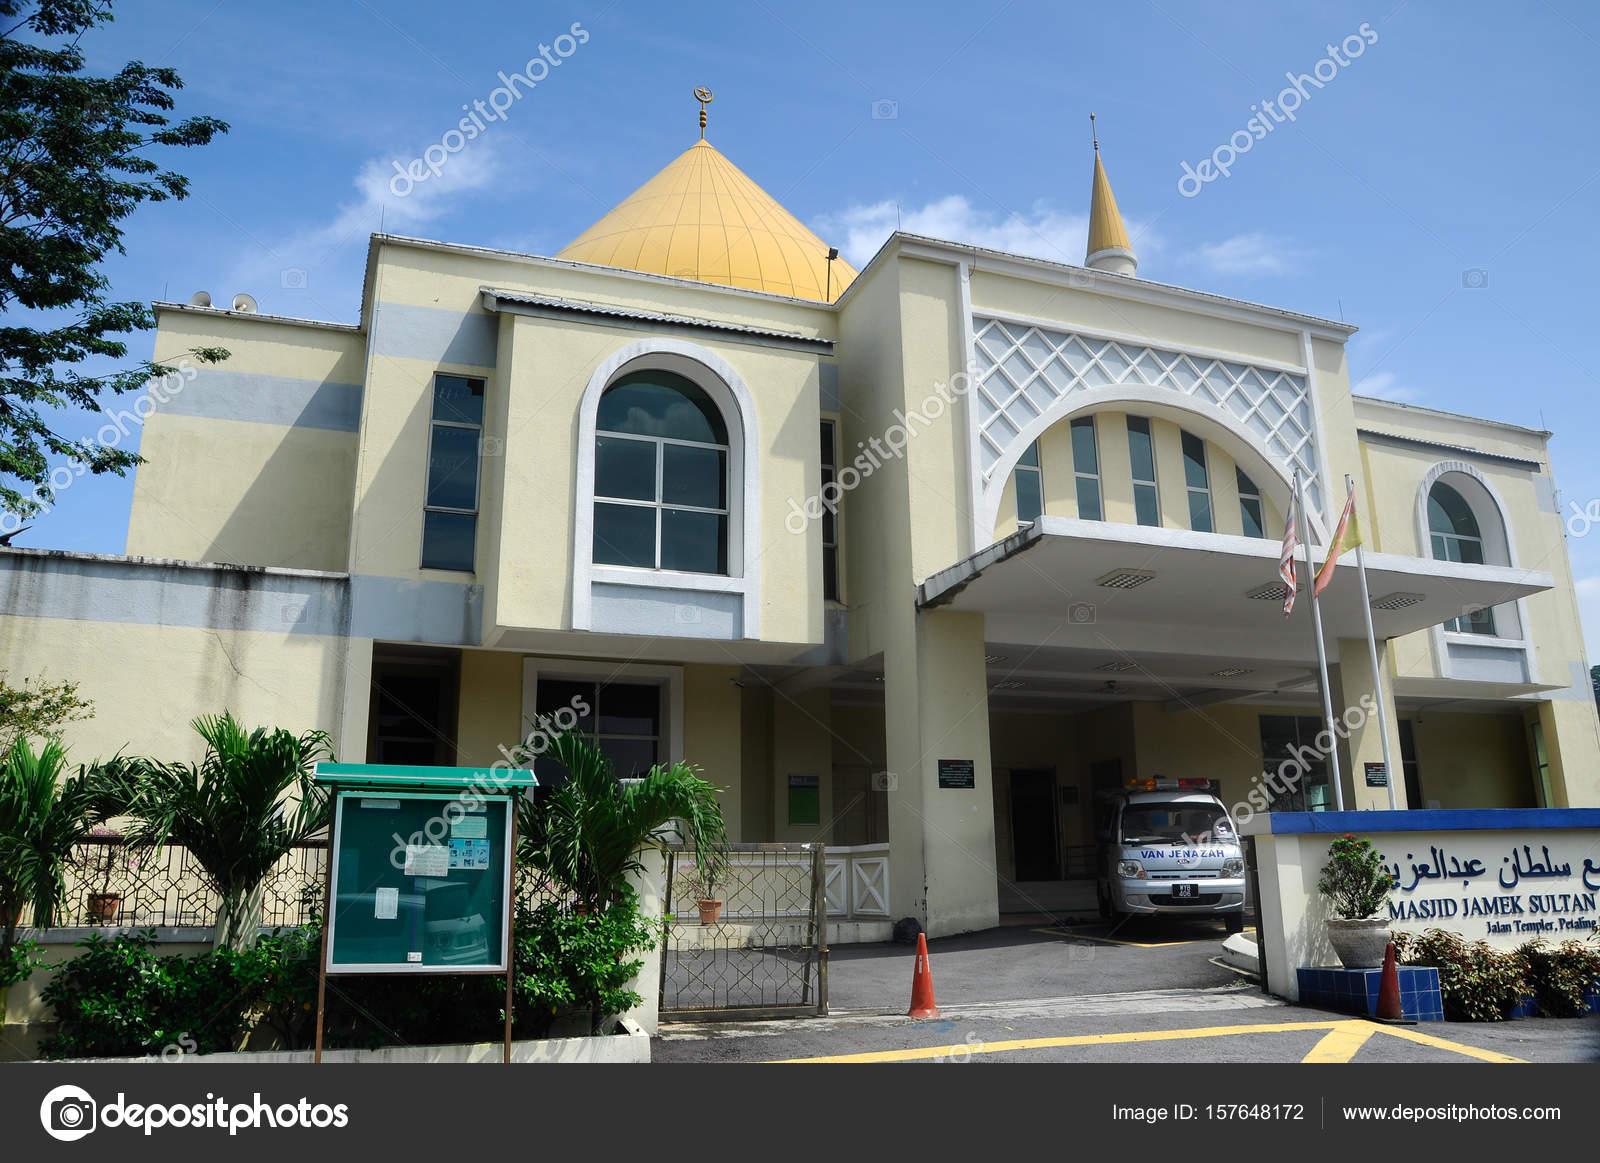 Exterior Of Masjid Jamek Sultan Abdul Aziz Stock Editorial Photo C Aisyaqilumar 157648172